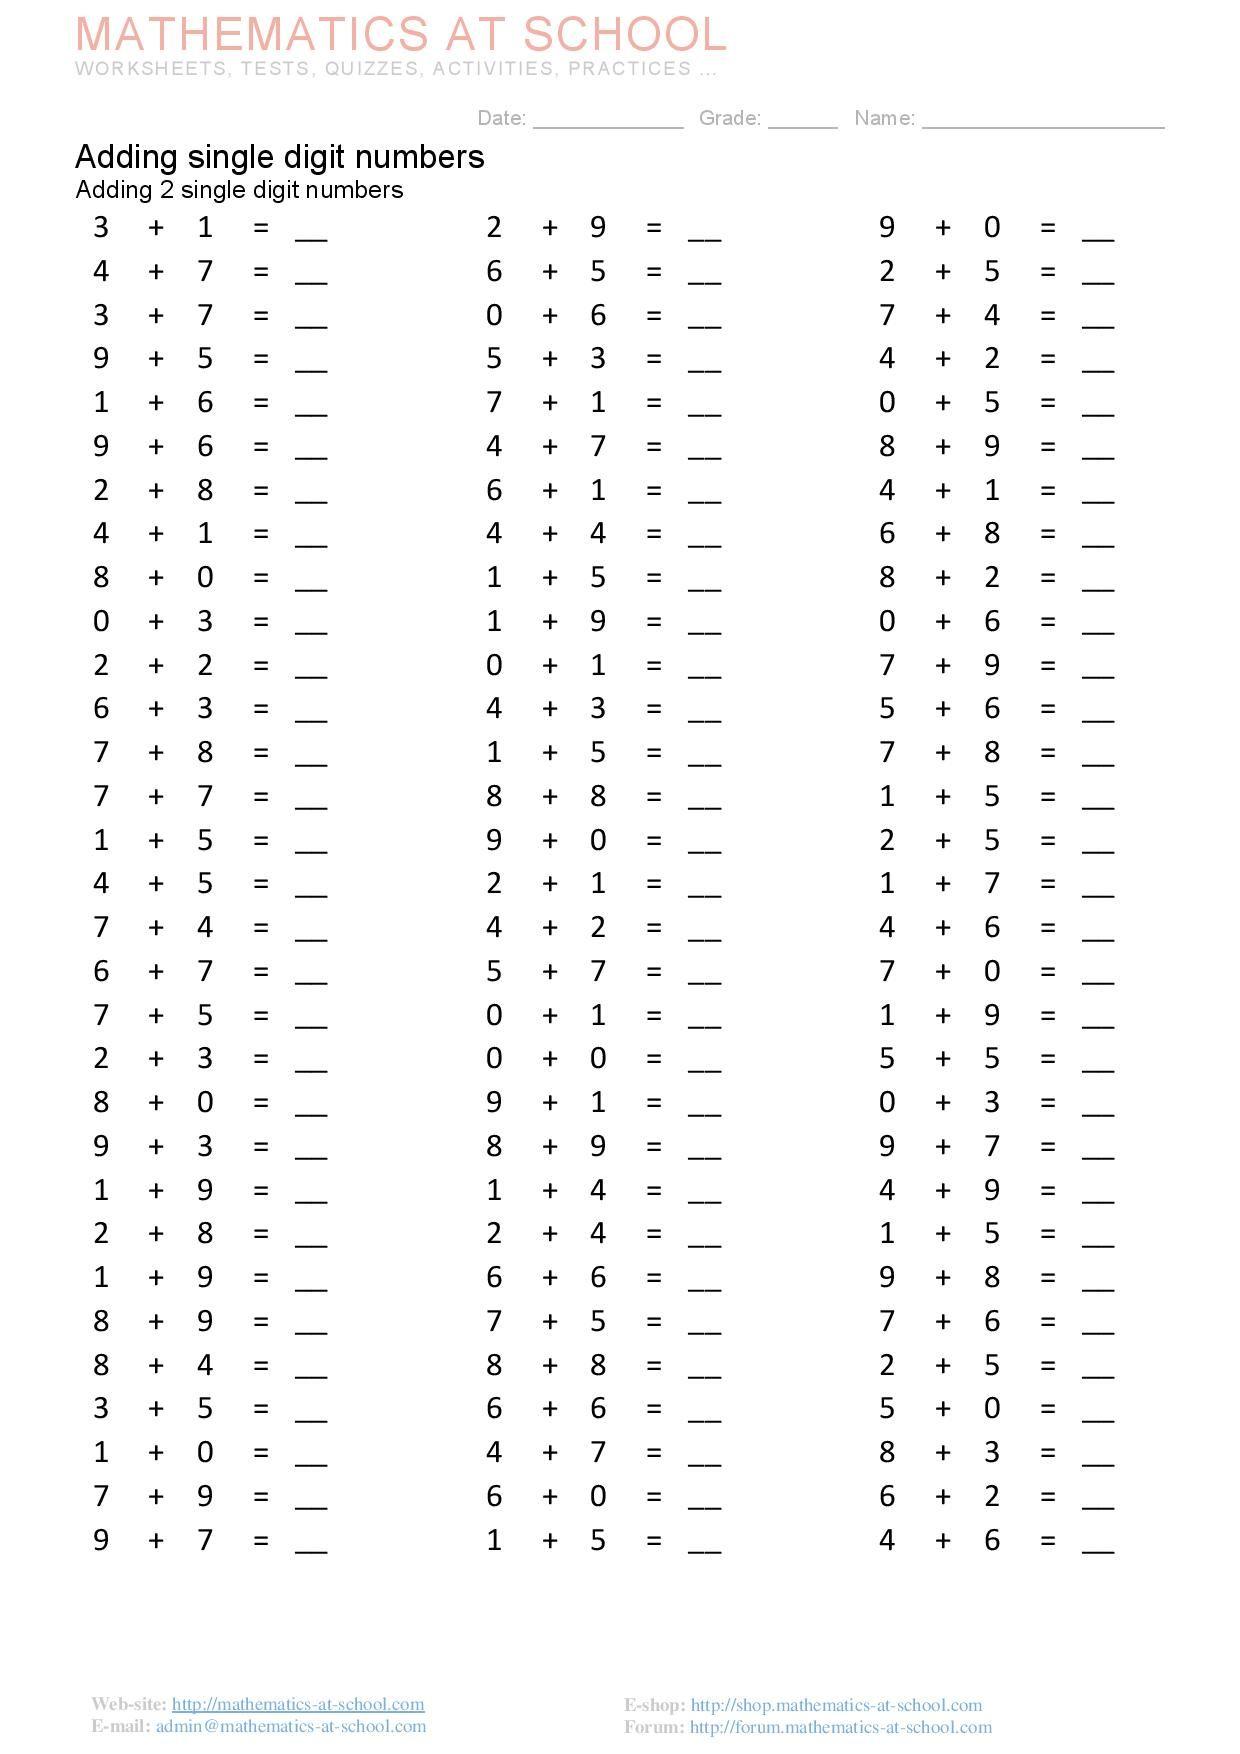 Adding single digit numbers Adding 2, 3, 4 single digit